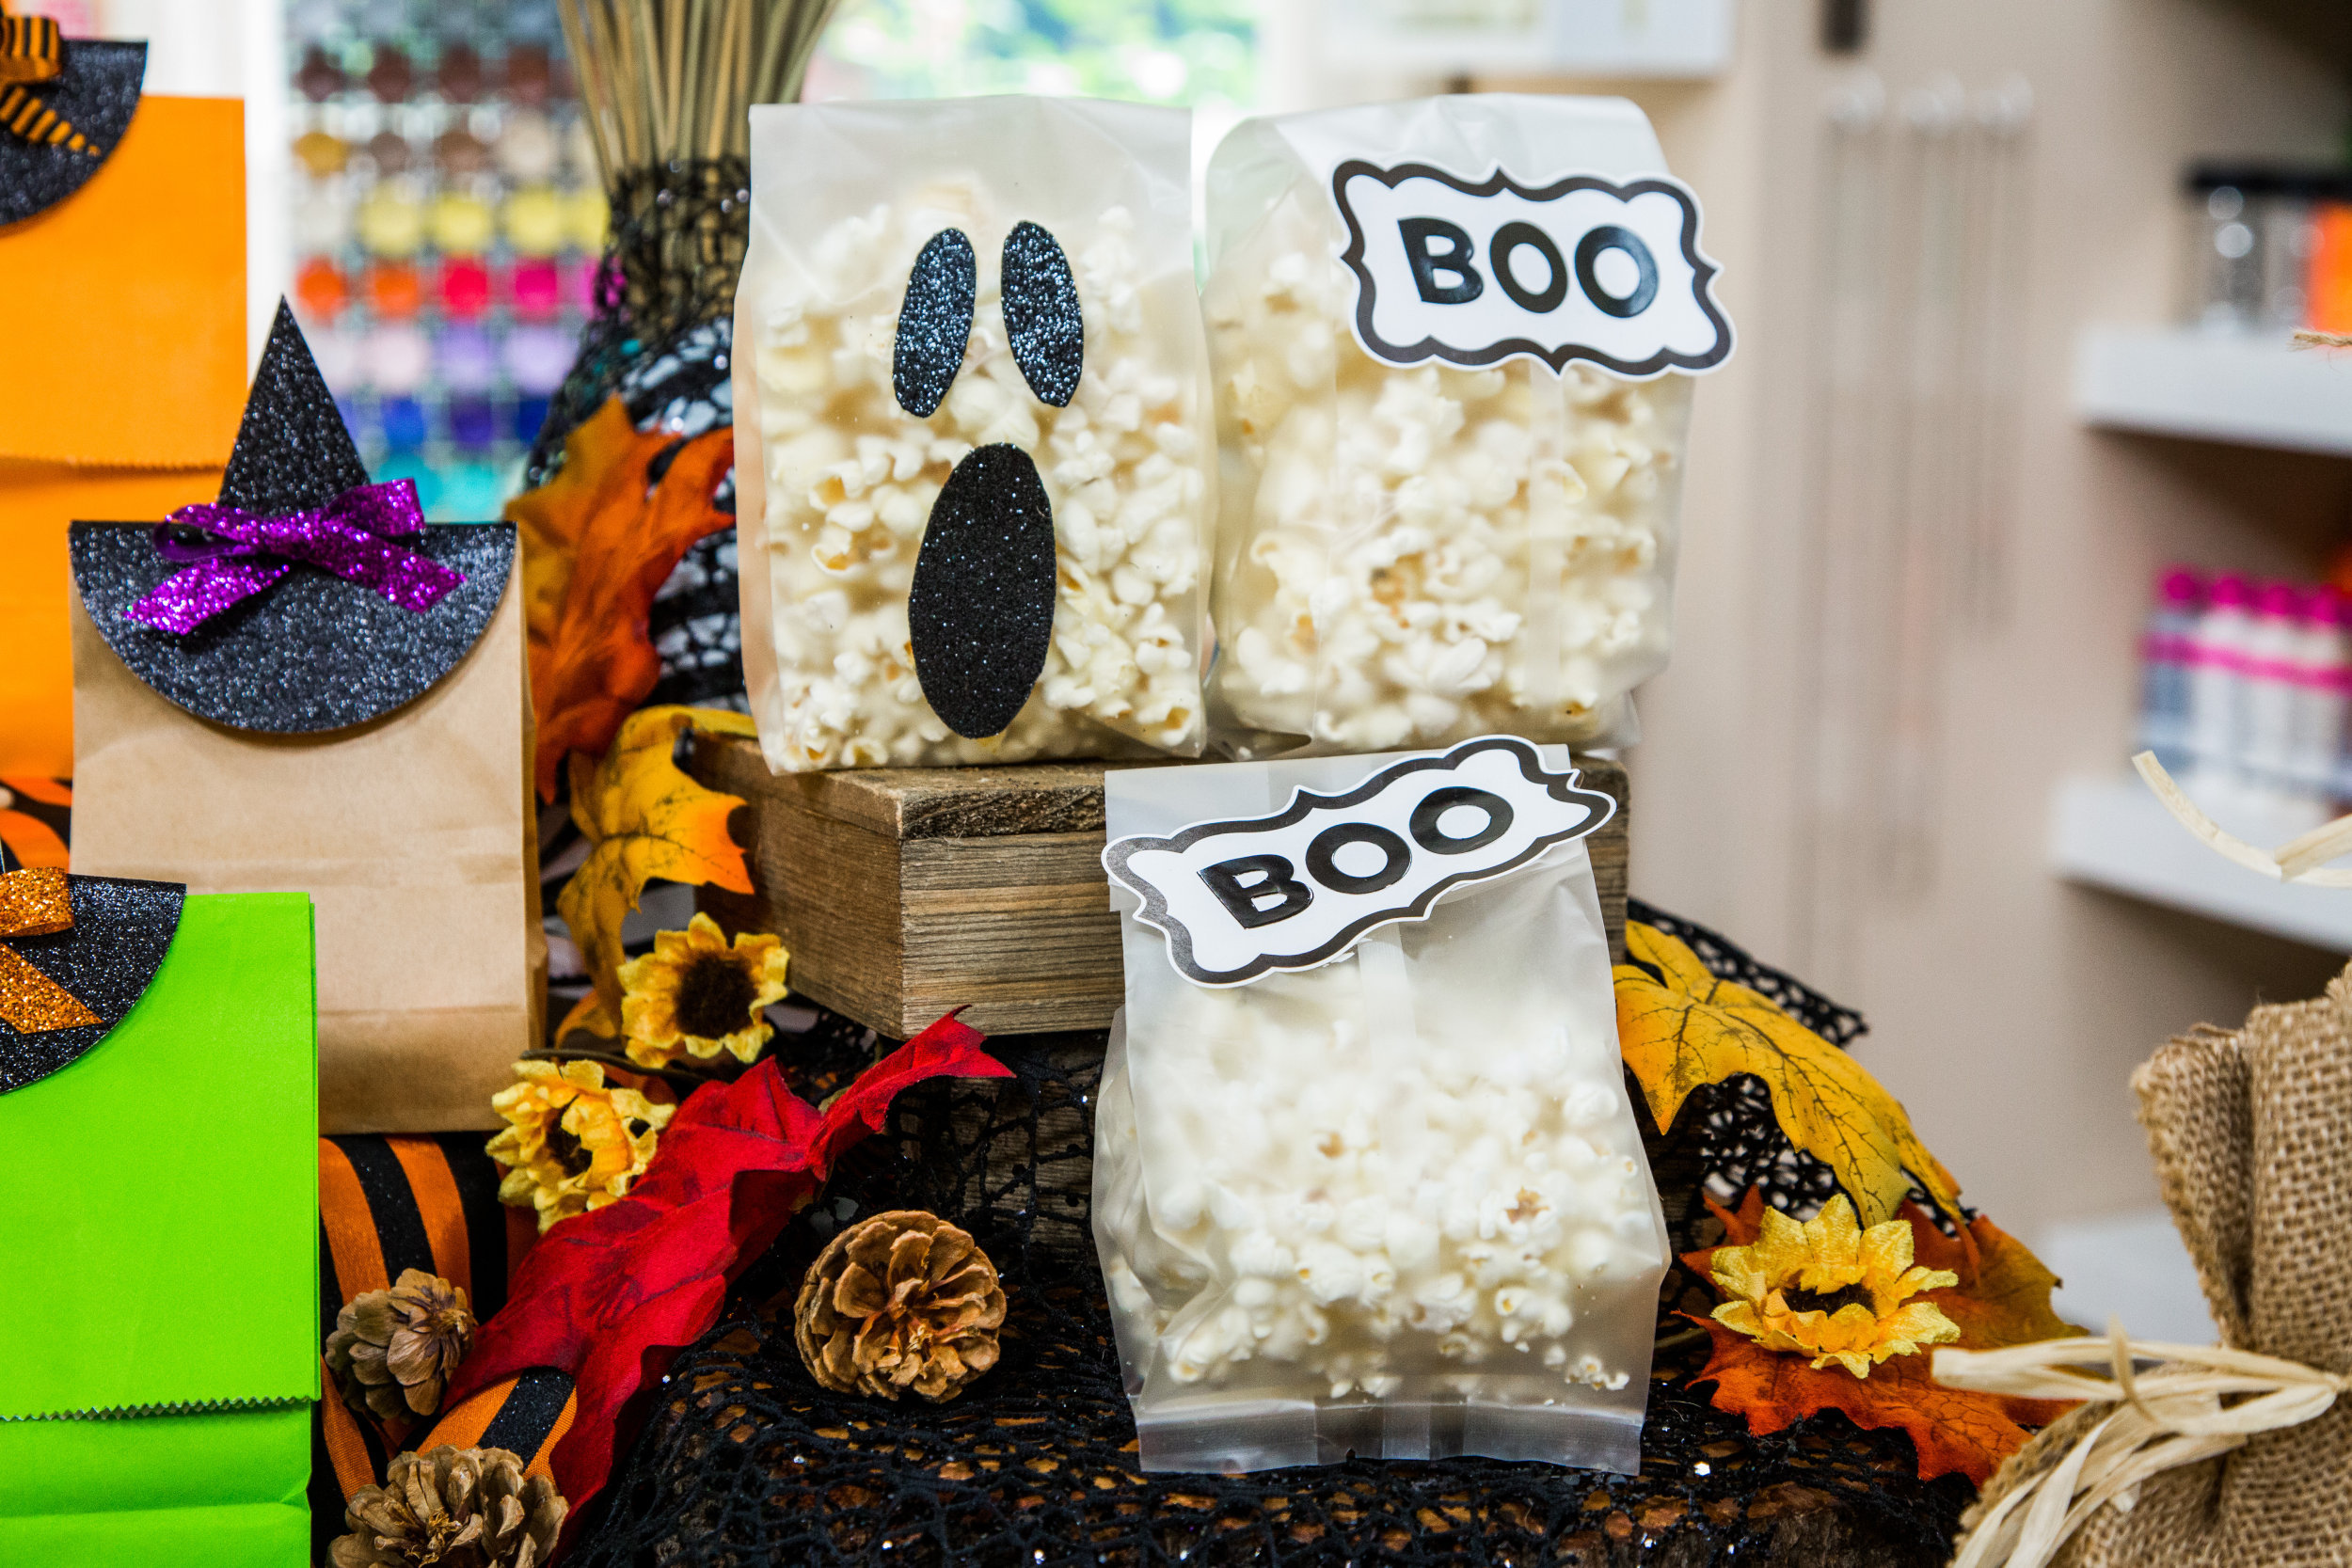 diy halloween goodie bags   home & family   hallmark channel